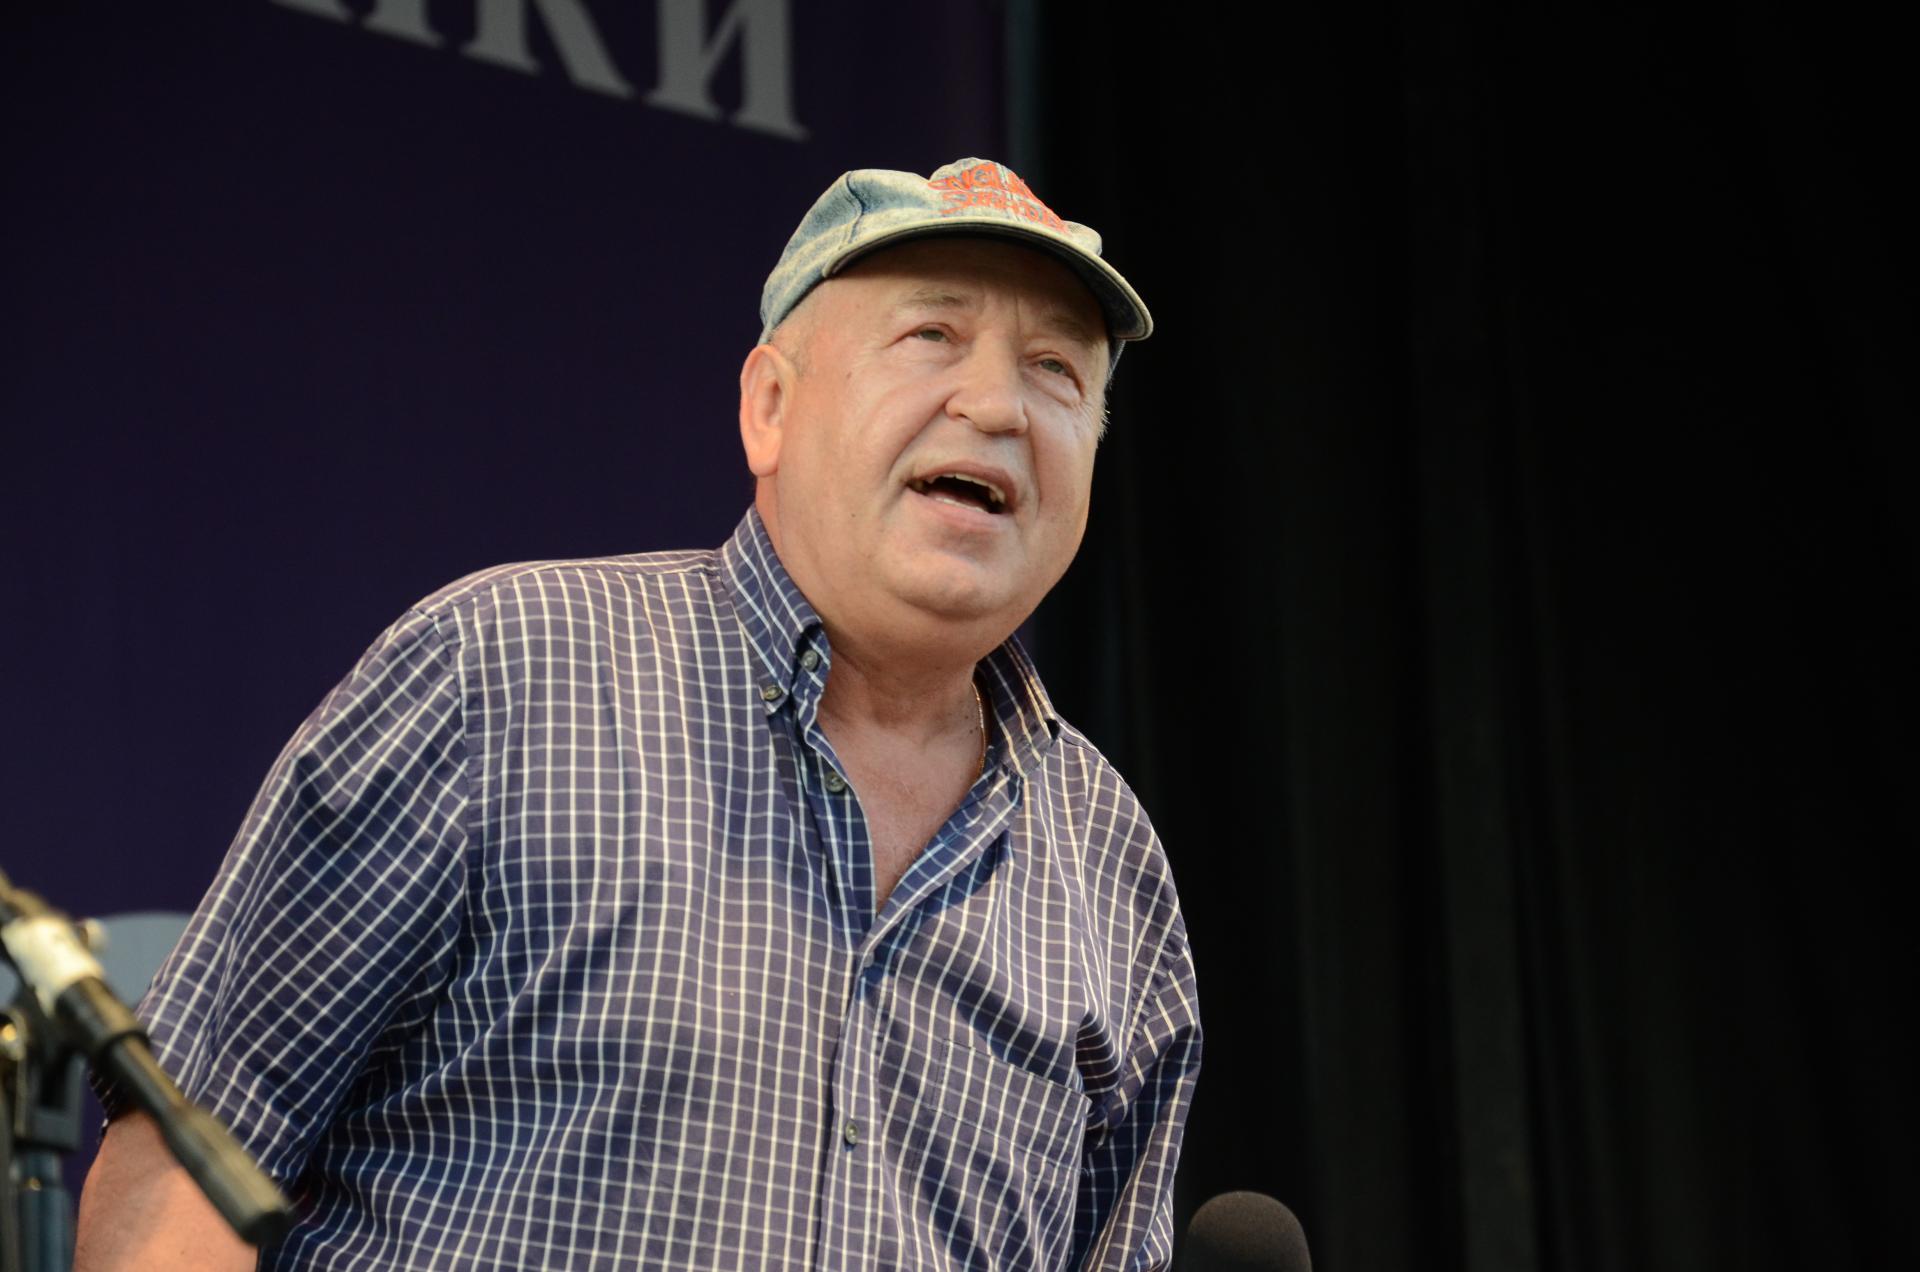 Виктор Пеленягрэ